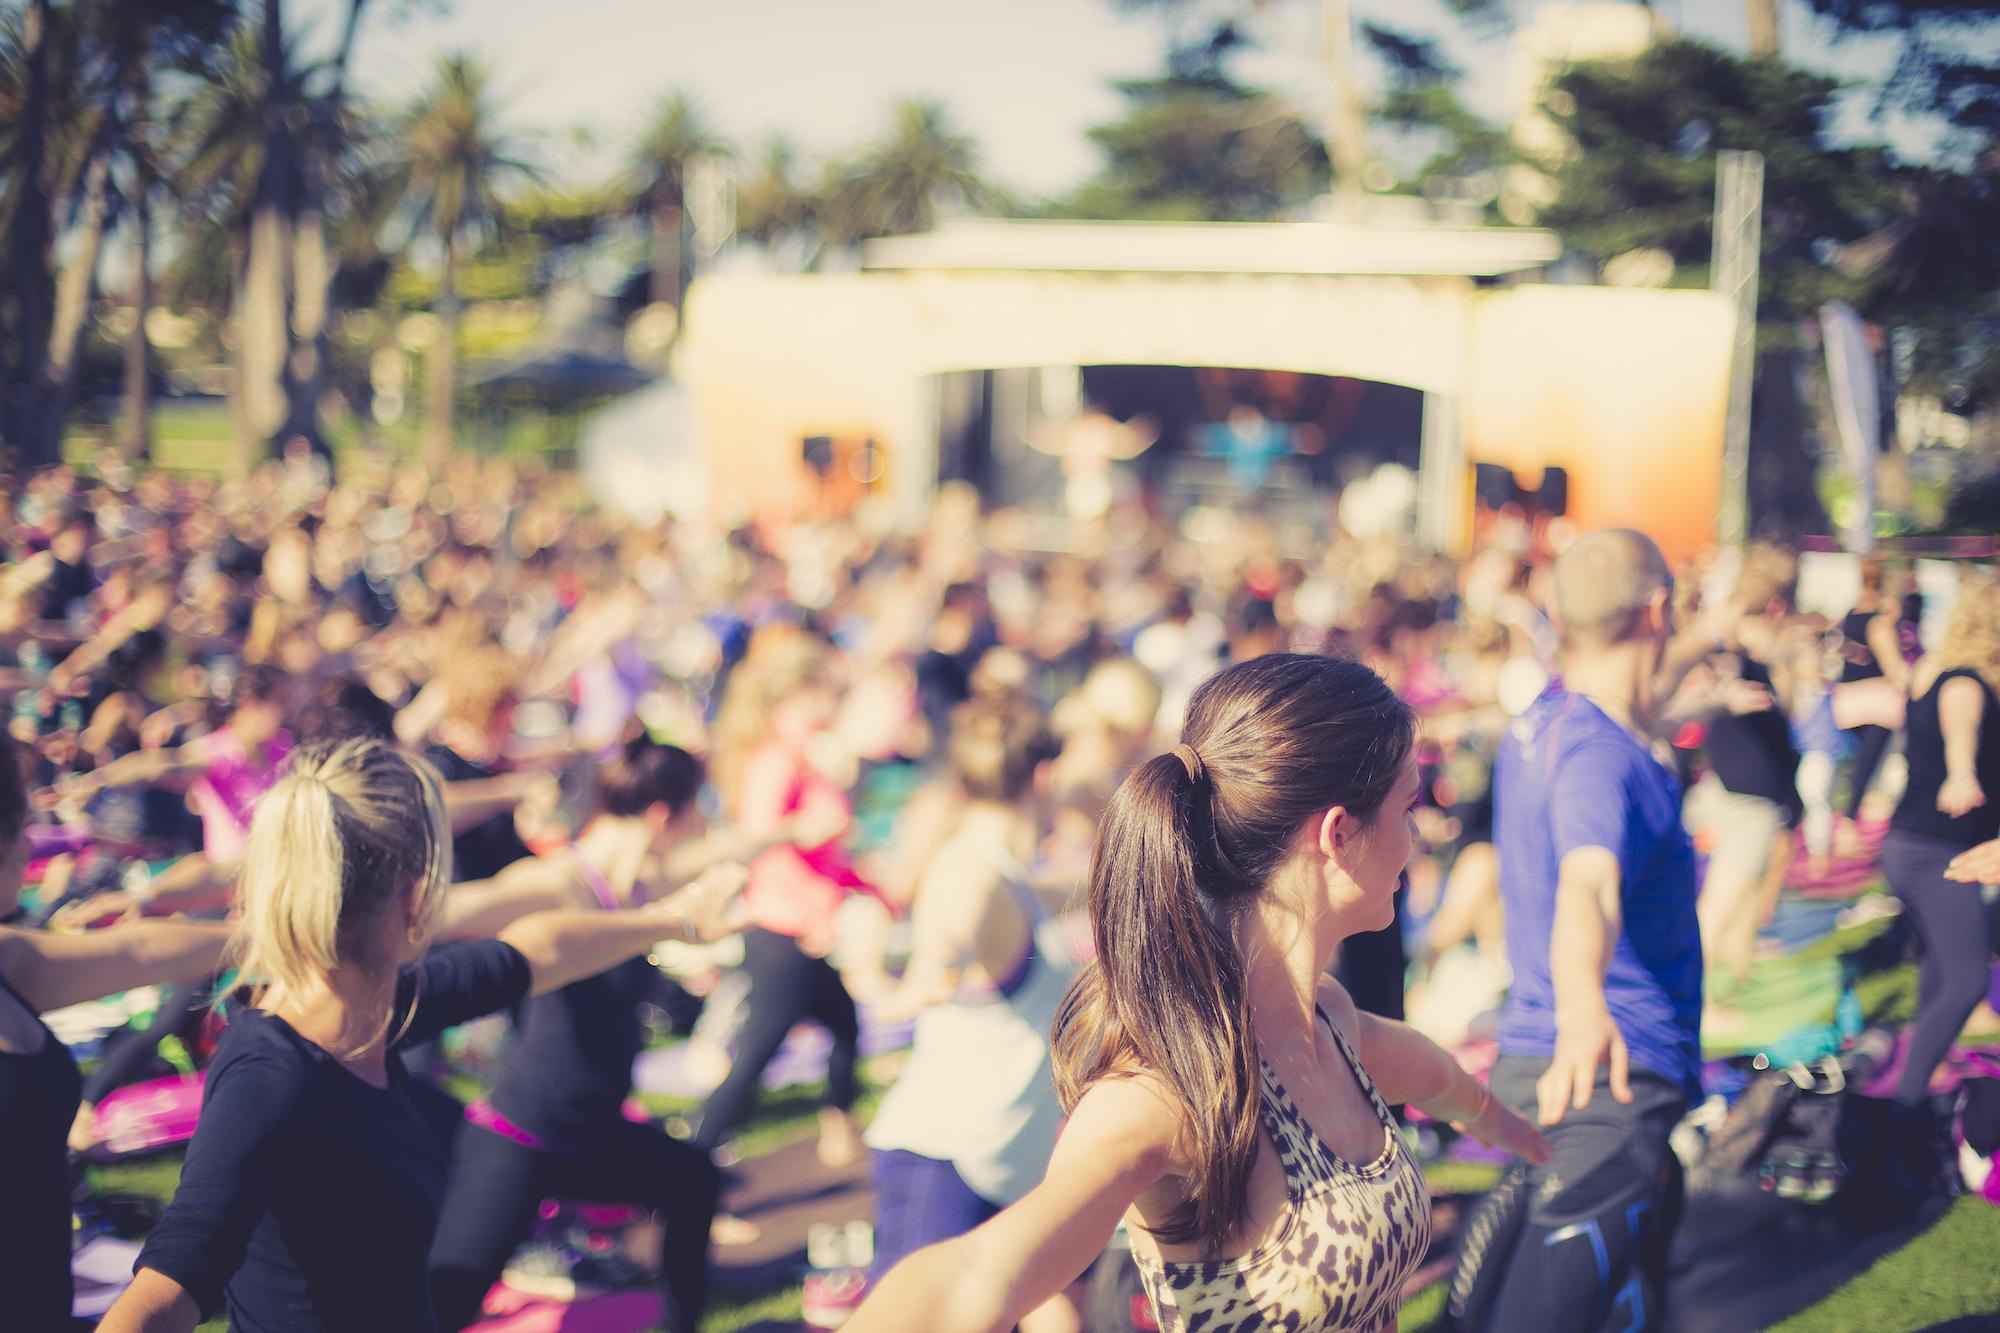 Health & Wellbeing: Wanderlust Festival - Eventbrite Profile